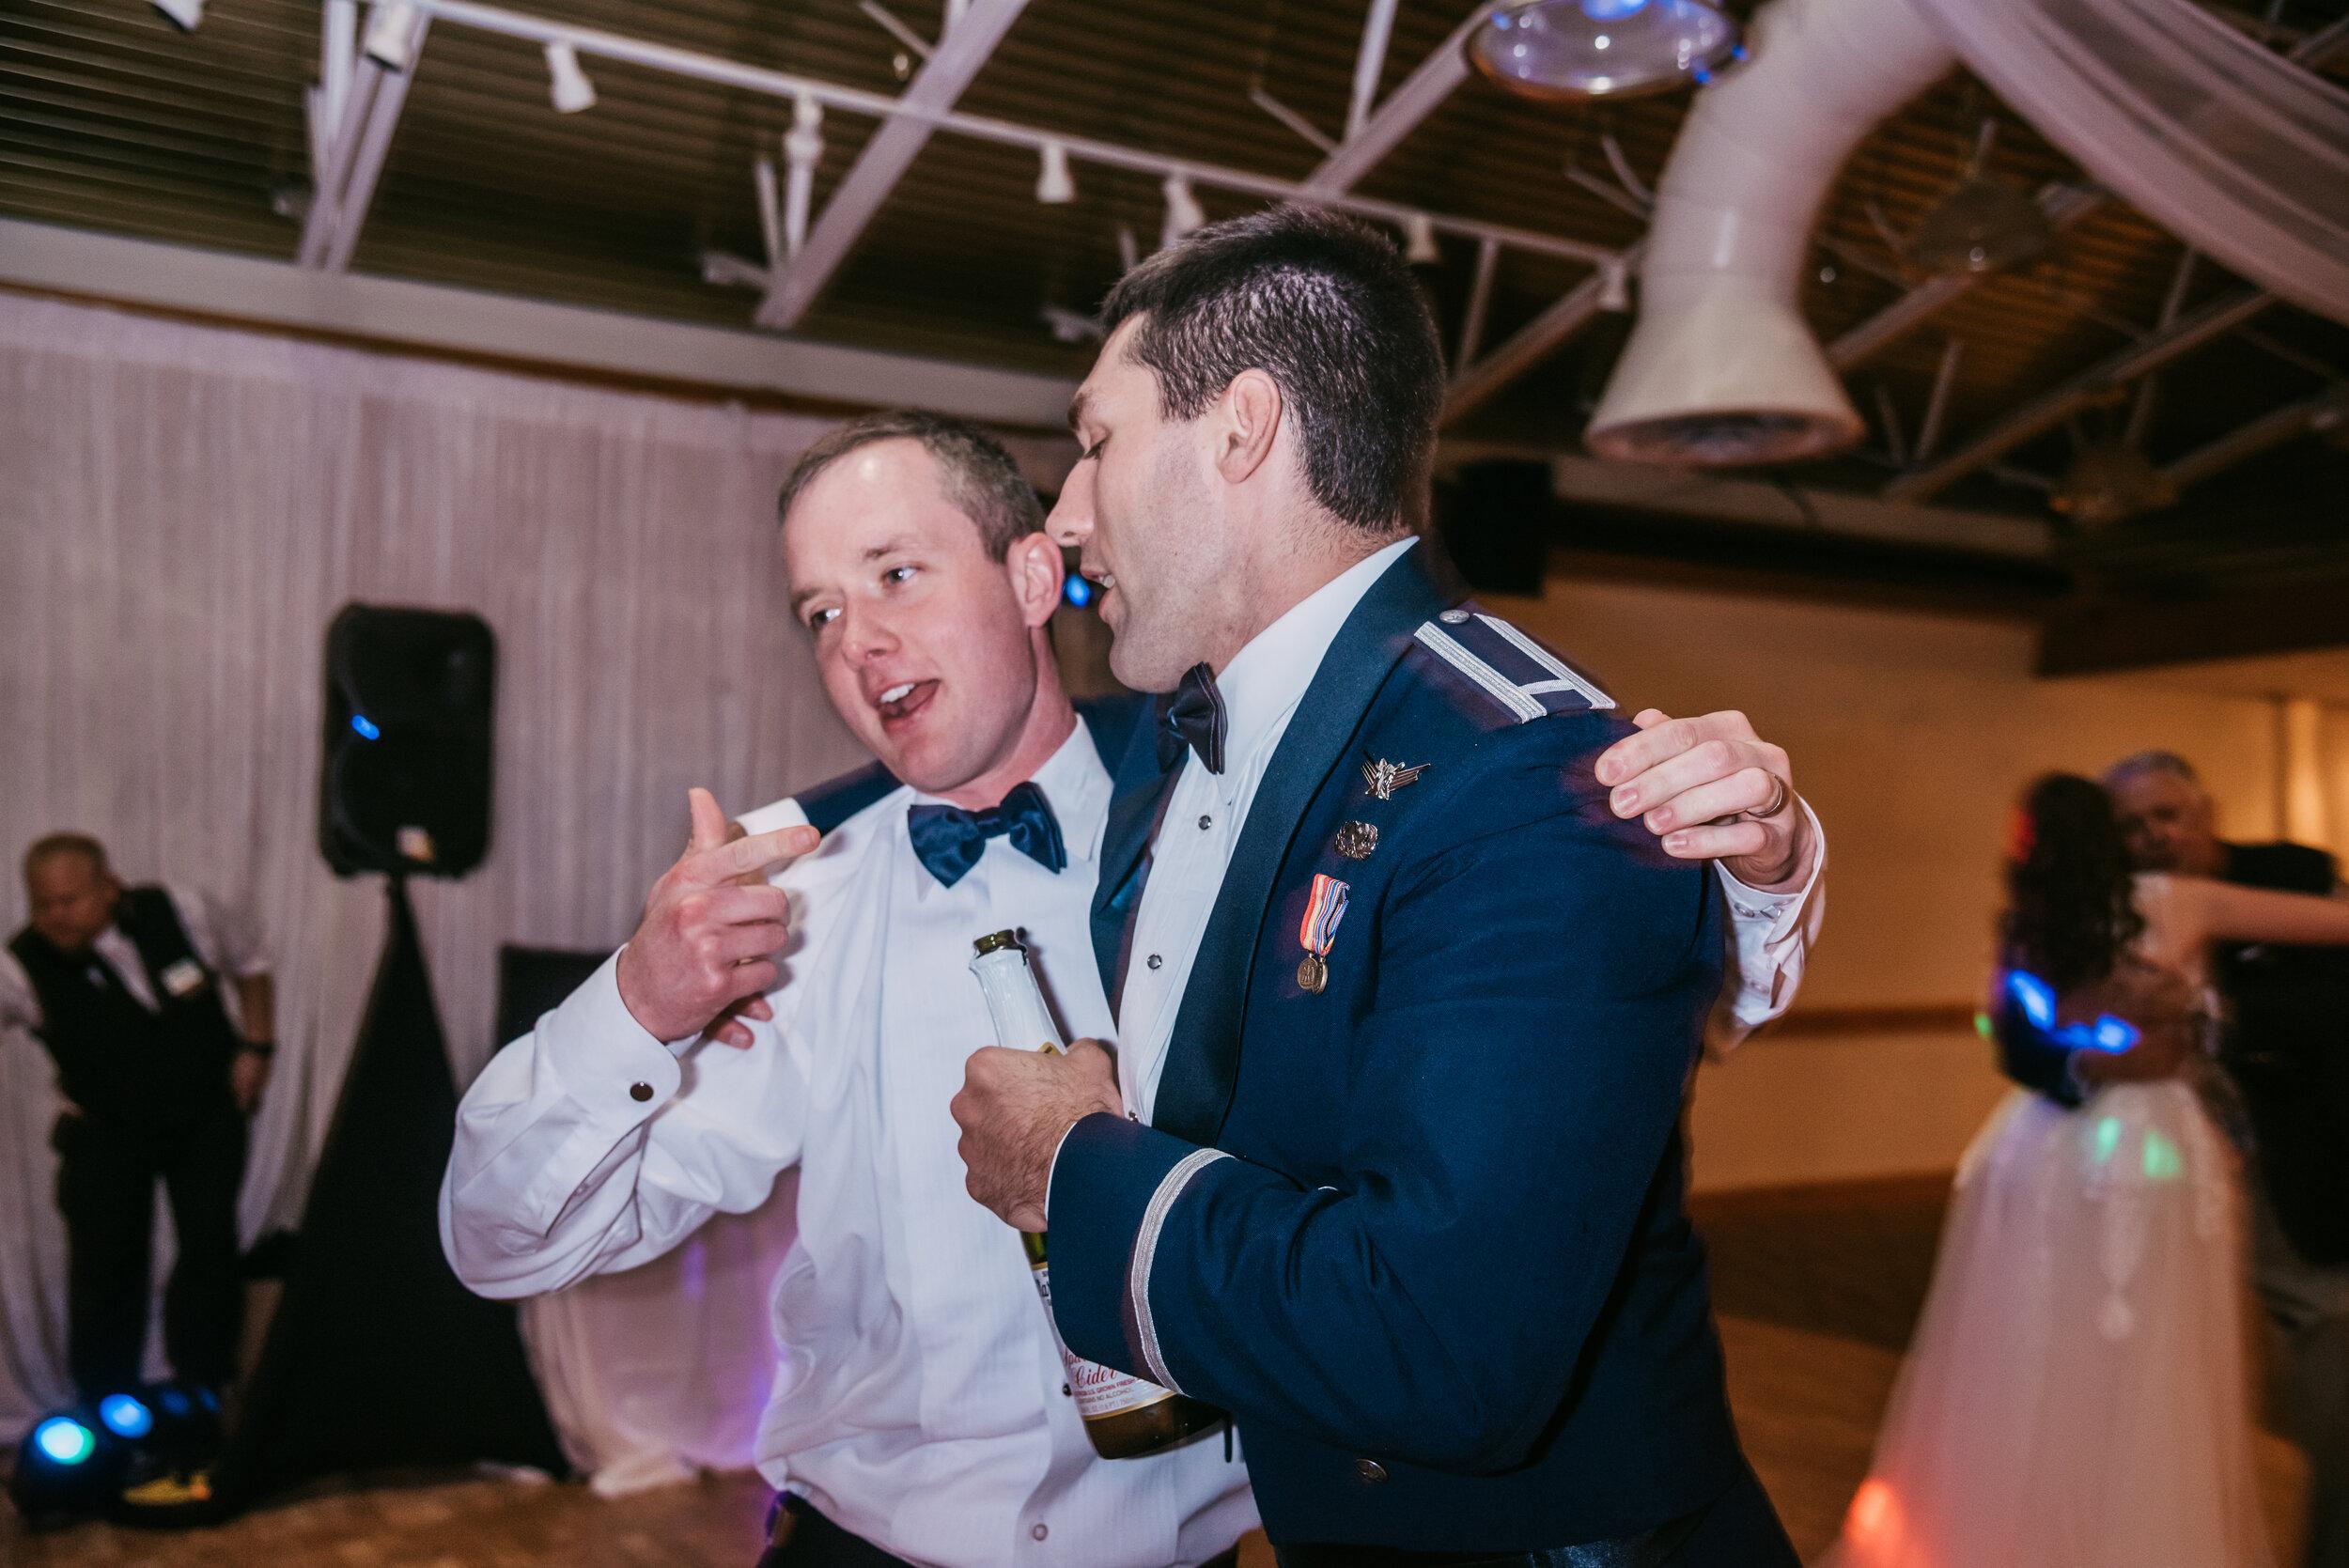 andru-the-tide-club-air-force-wedding-patrickafb-1-137.jpg